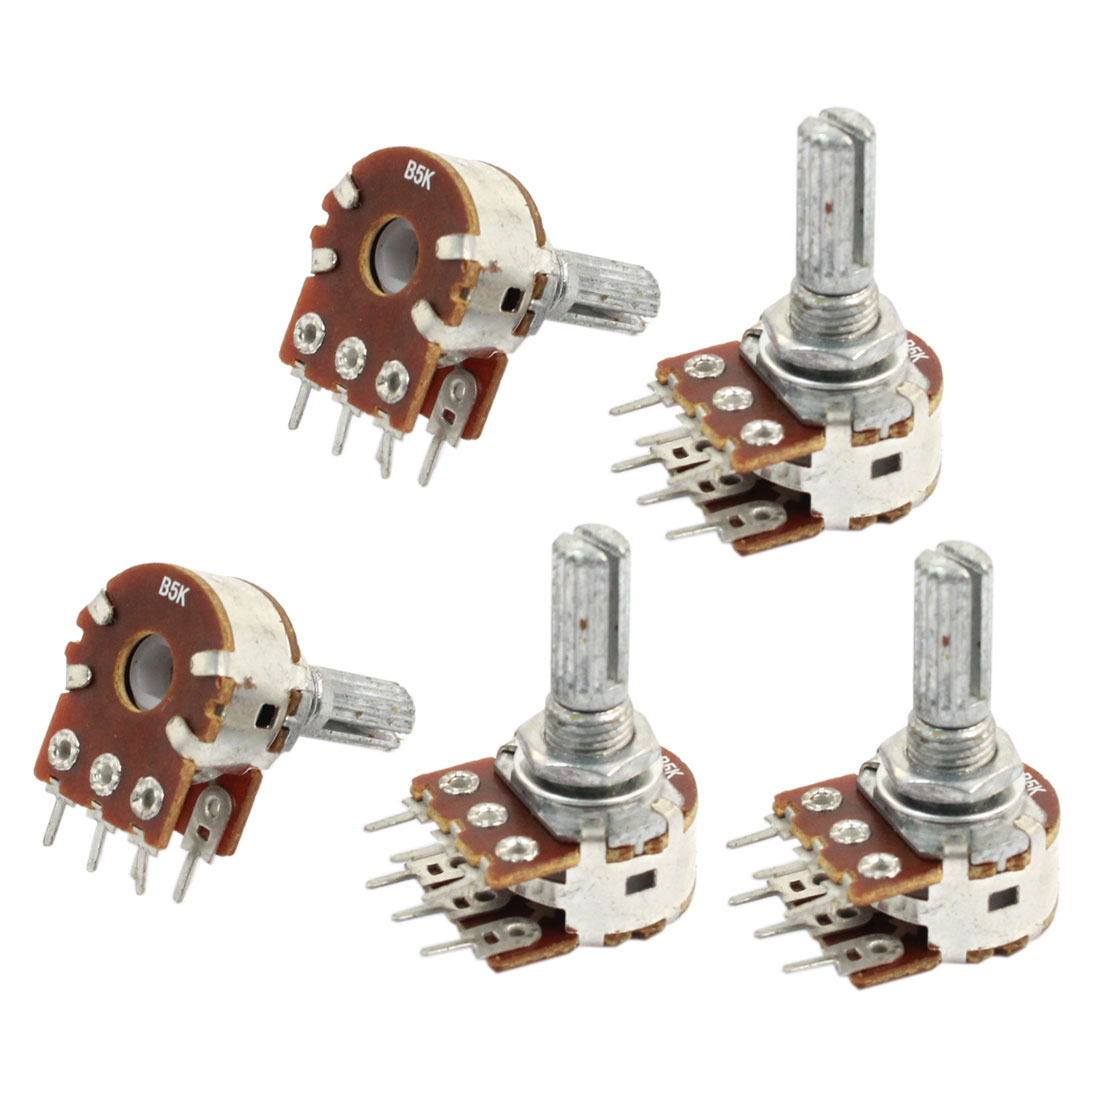 5 Pcs B5K Ohm Knurled Shaft Adjust Double Linear Potentiometers AC 250V